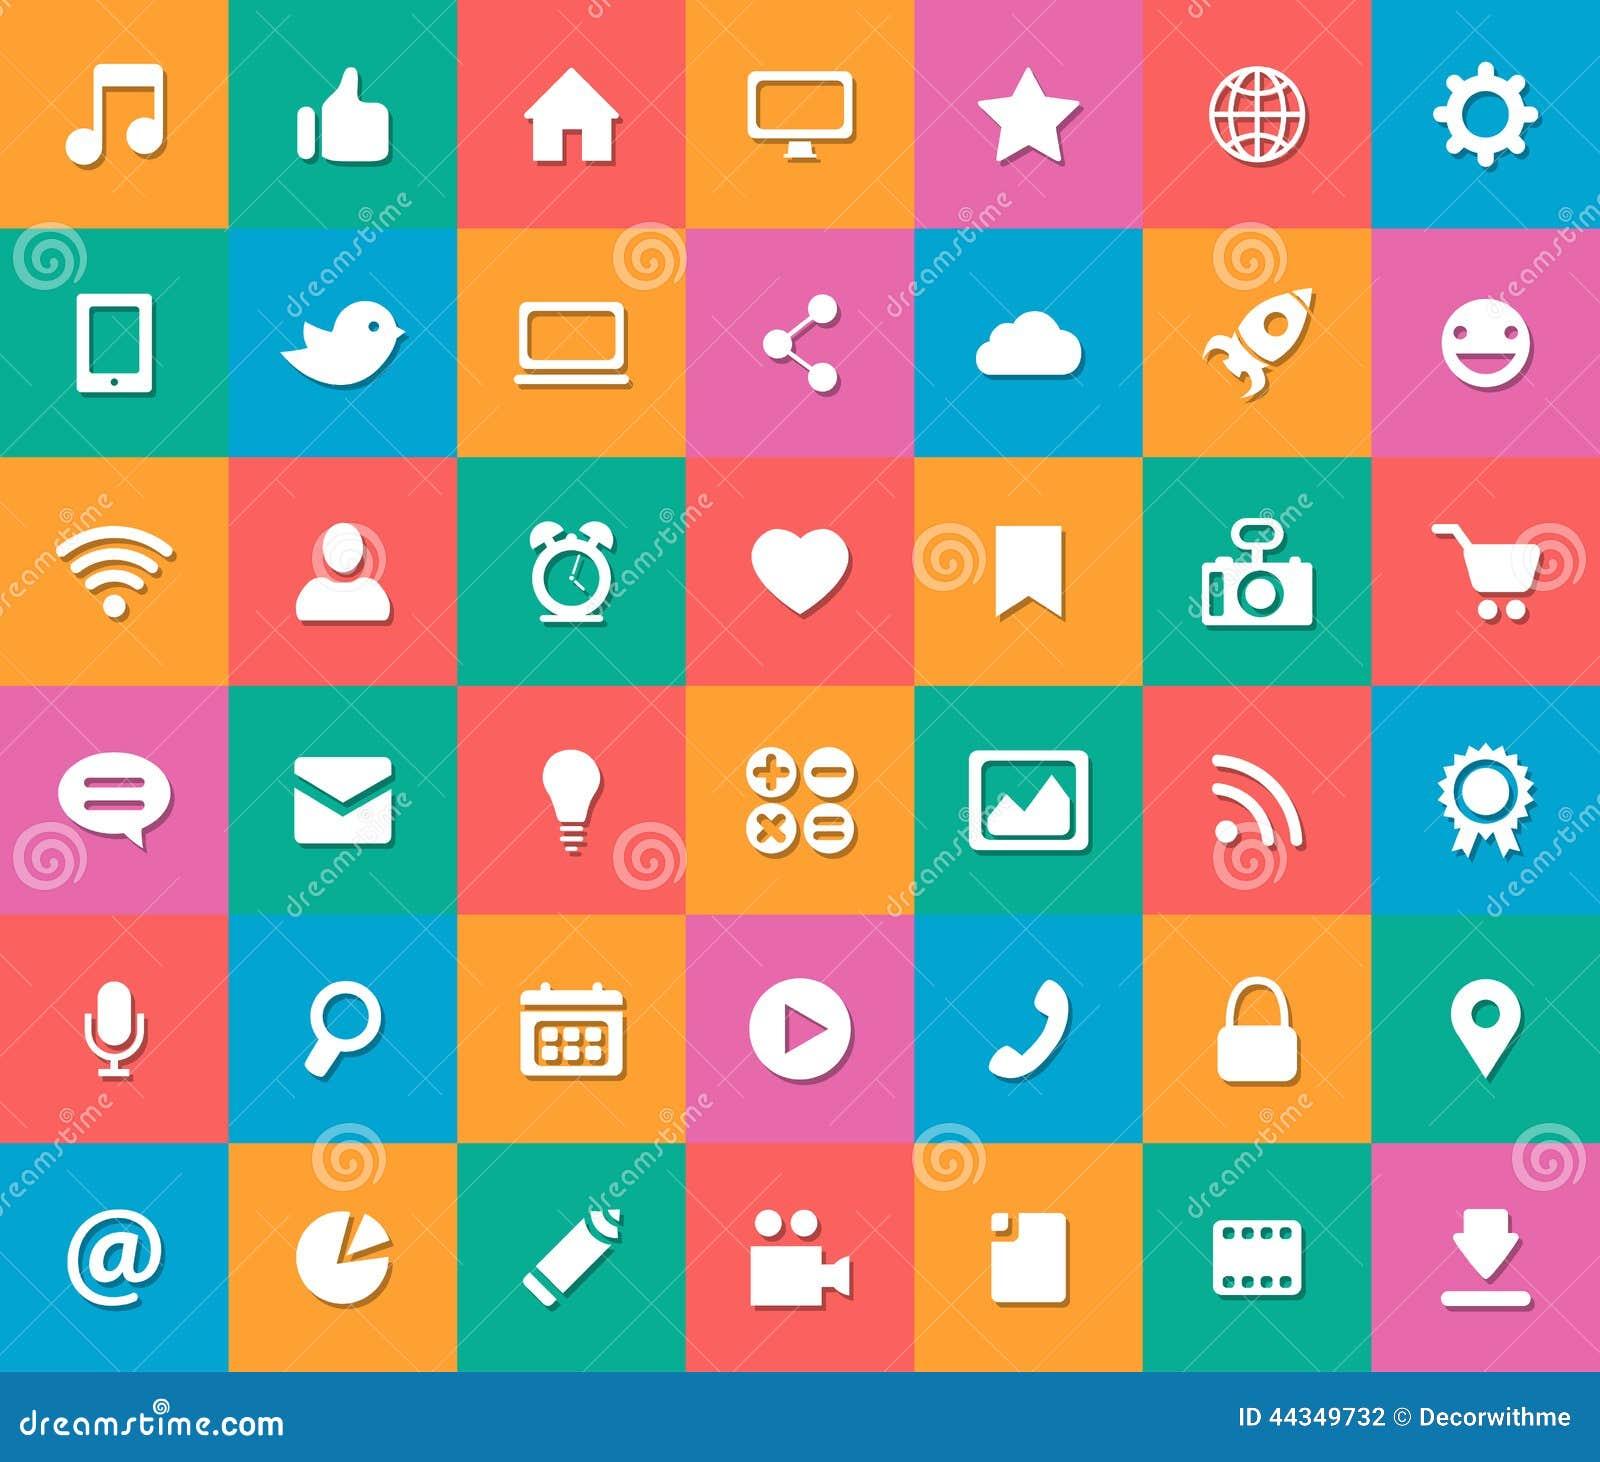 social media flat icon set cartoon vector cartoondealer